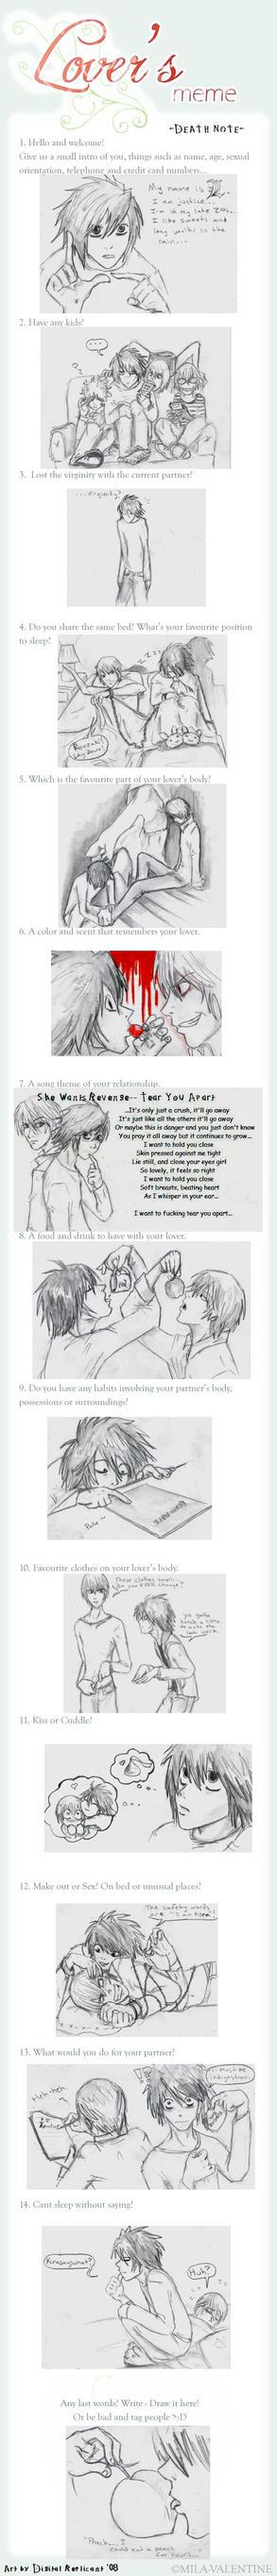 L x Light -Death Note meme- by digitalreplicant